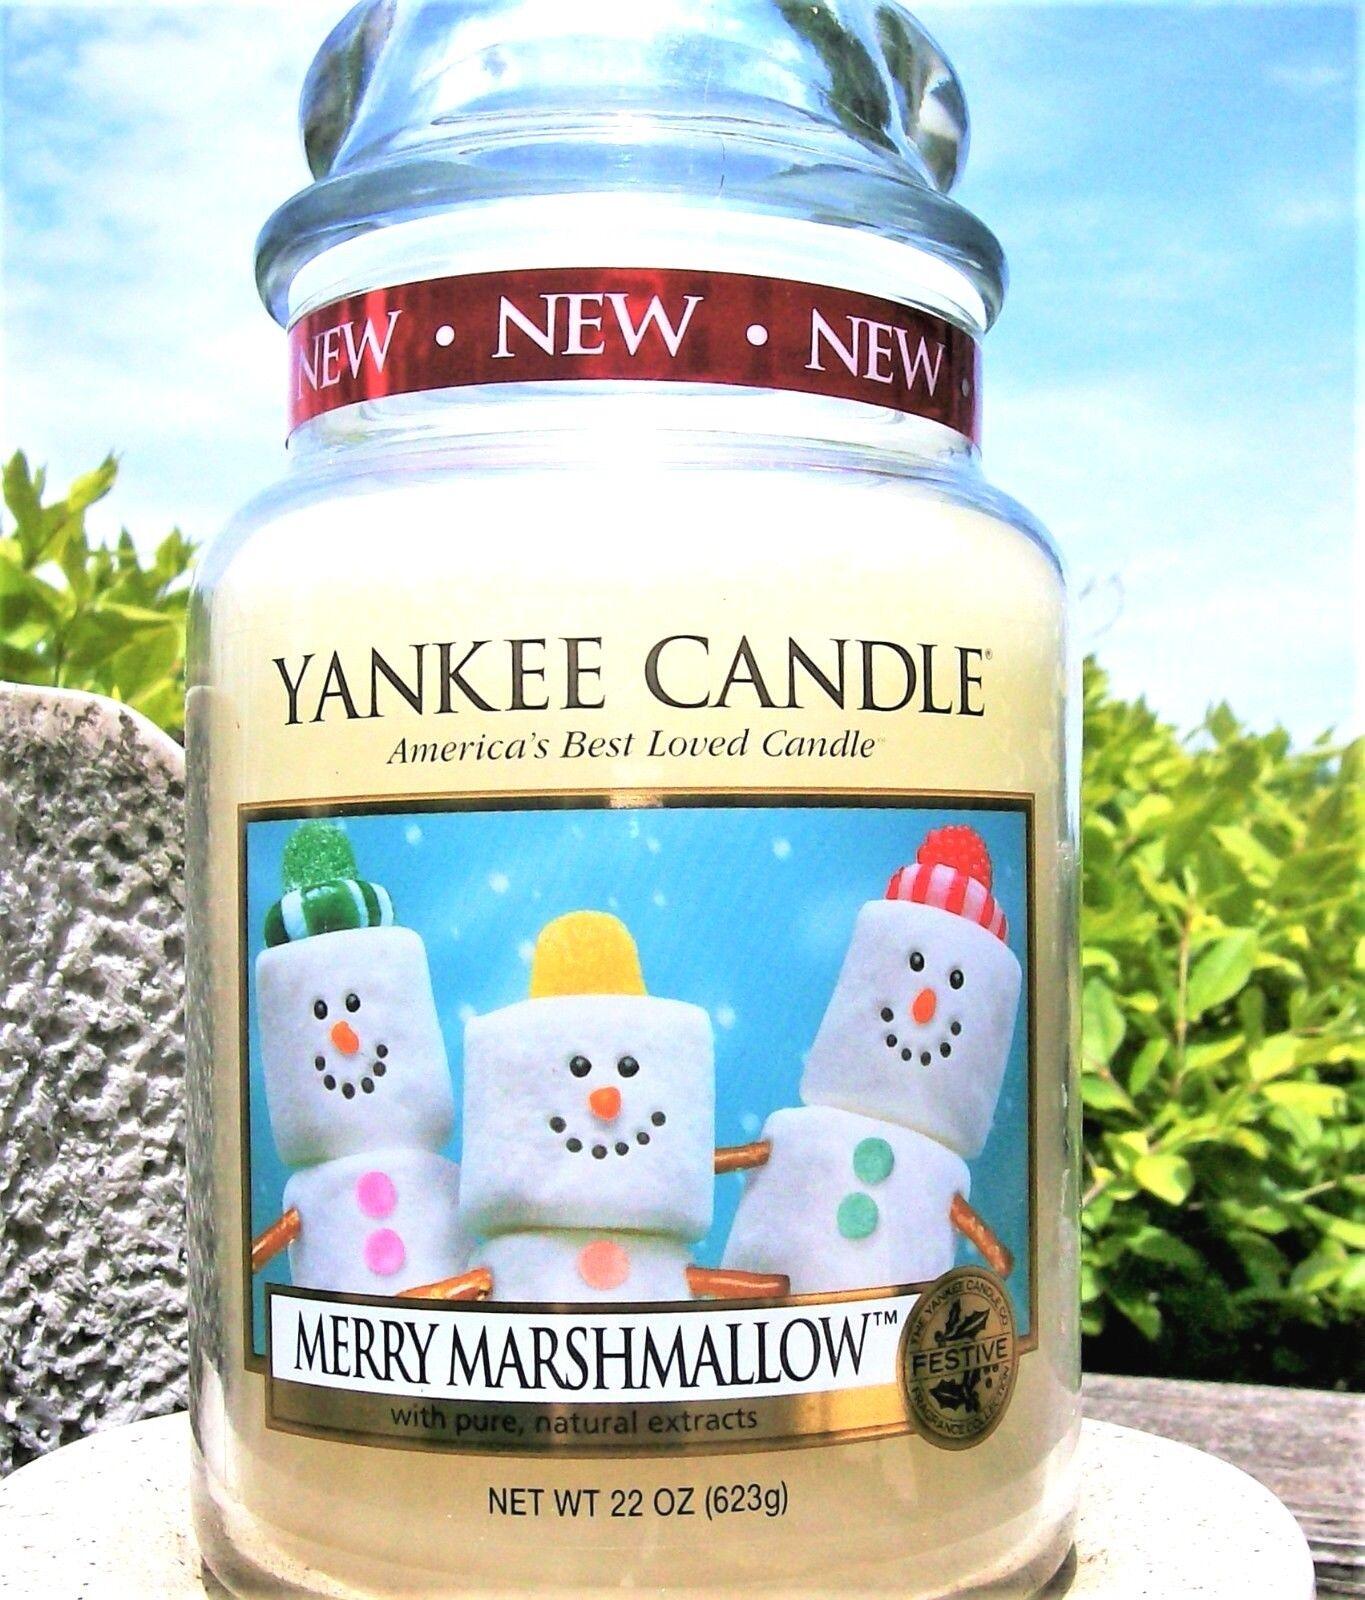 Yankee Candle Retirot  MERRY MARSHMALLOW  Festive 22 oz Weiß LABEL RARE  NEW